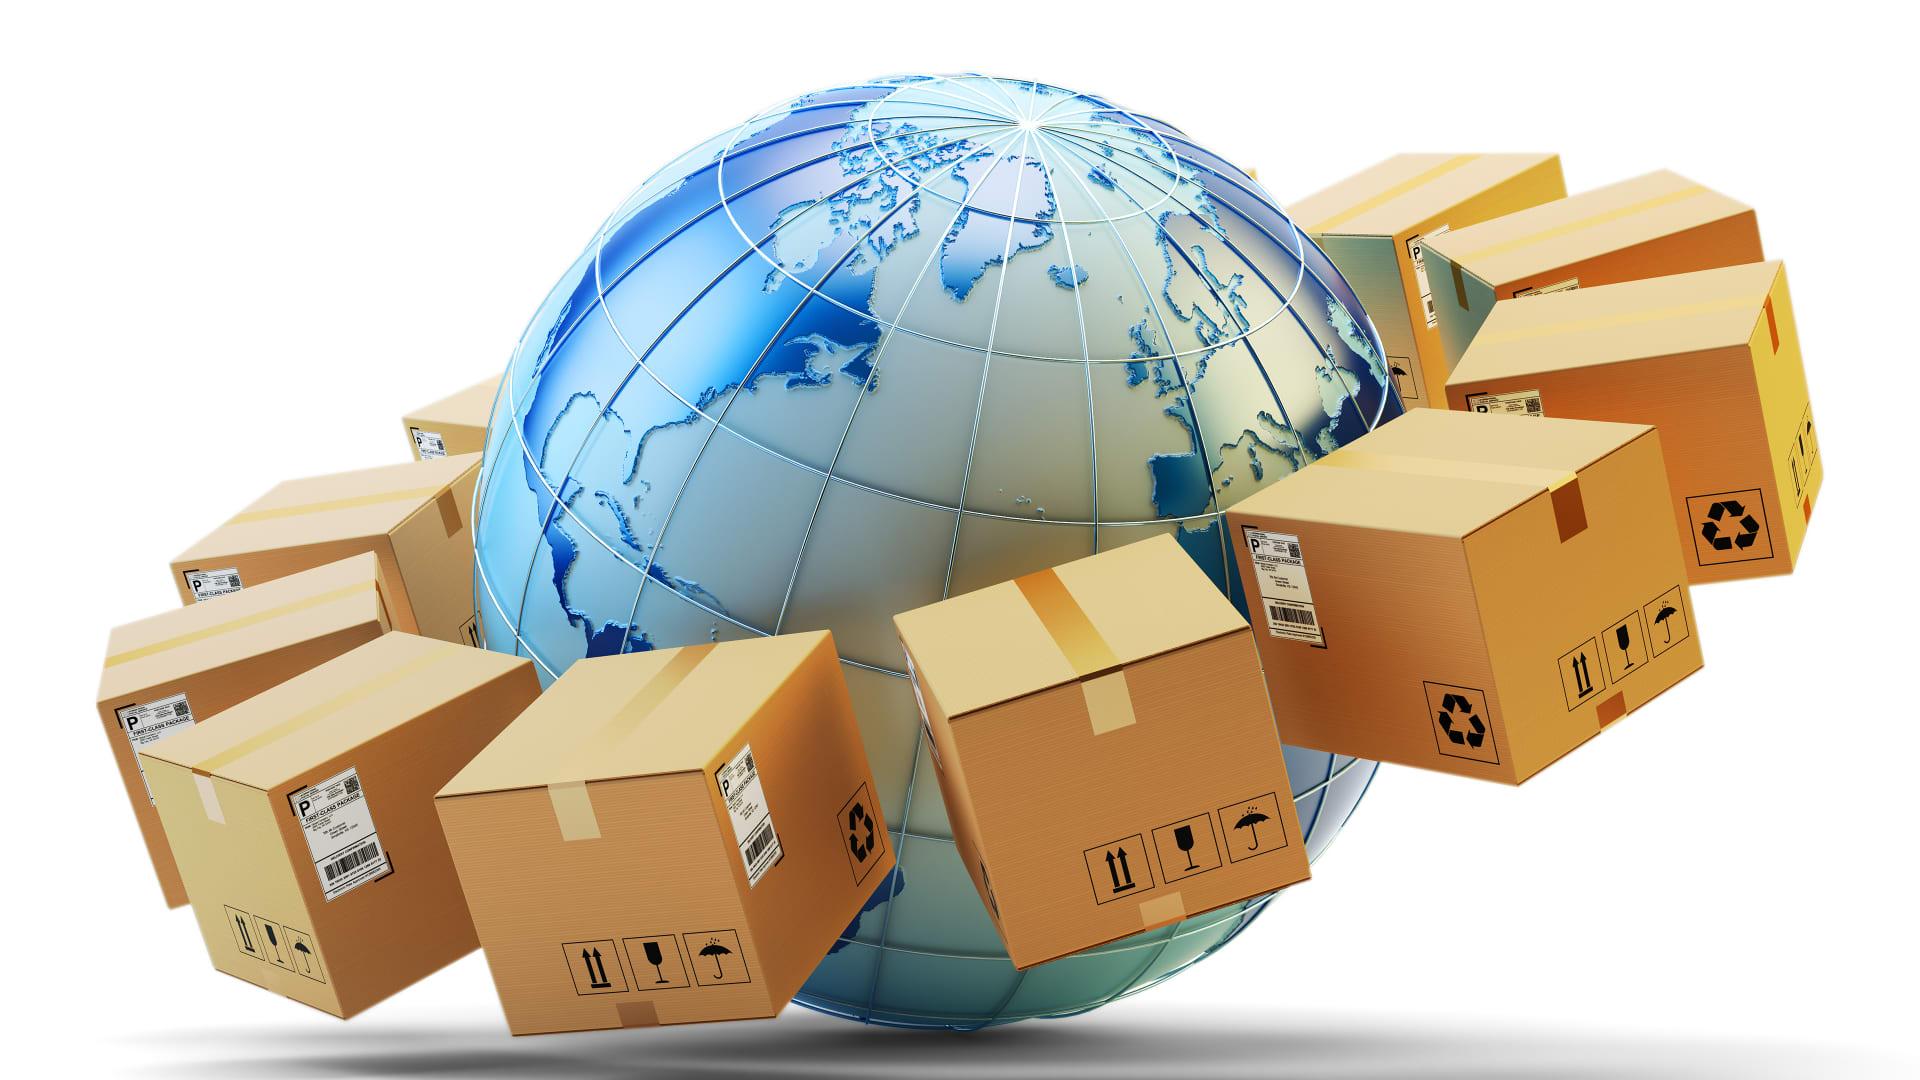 Amazon boxes surrounding globe